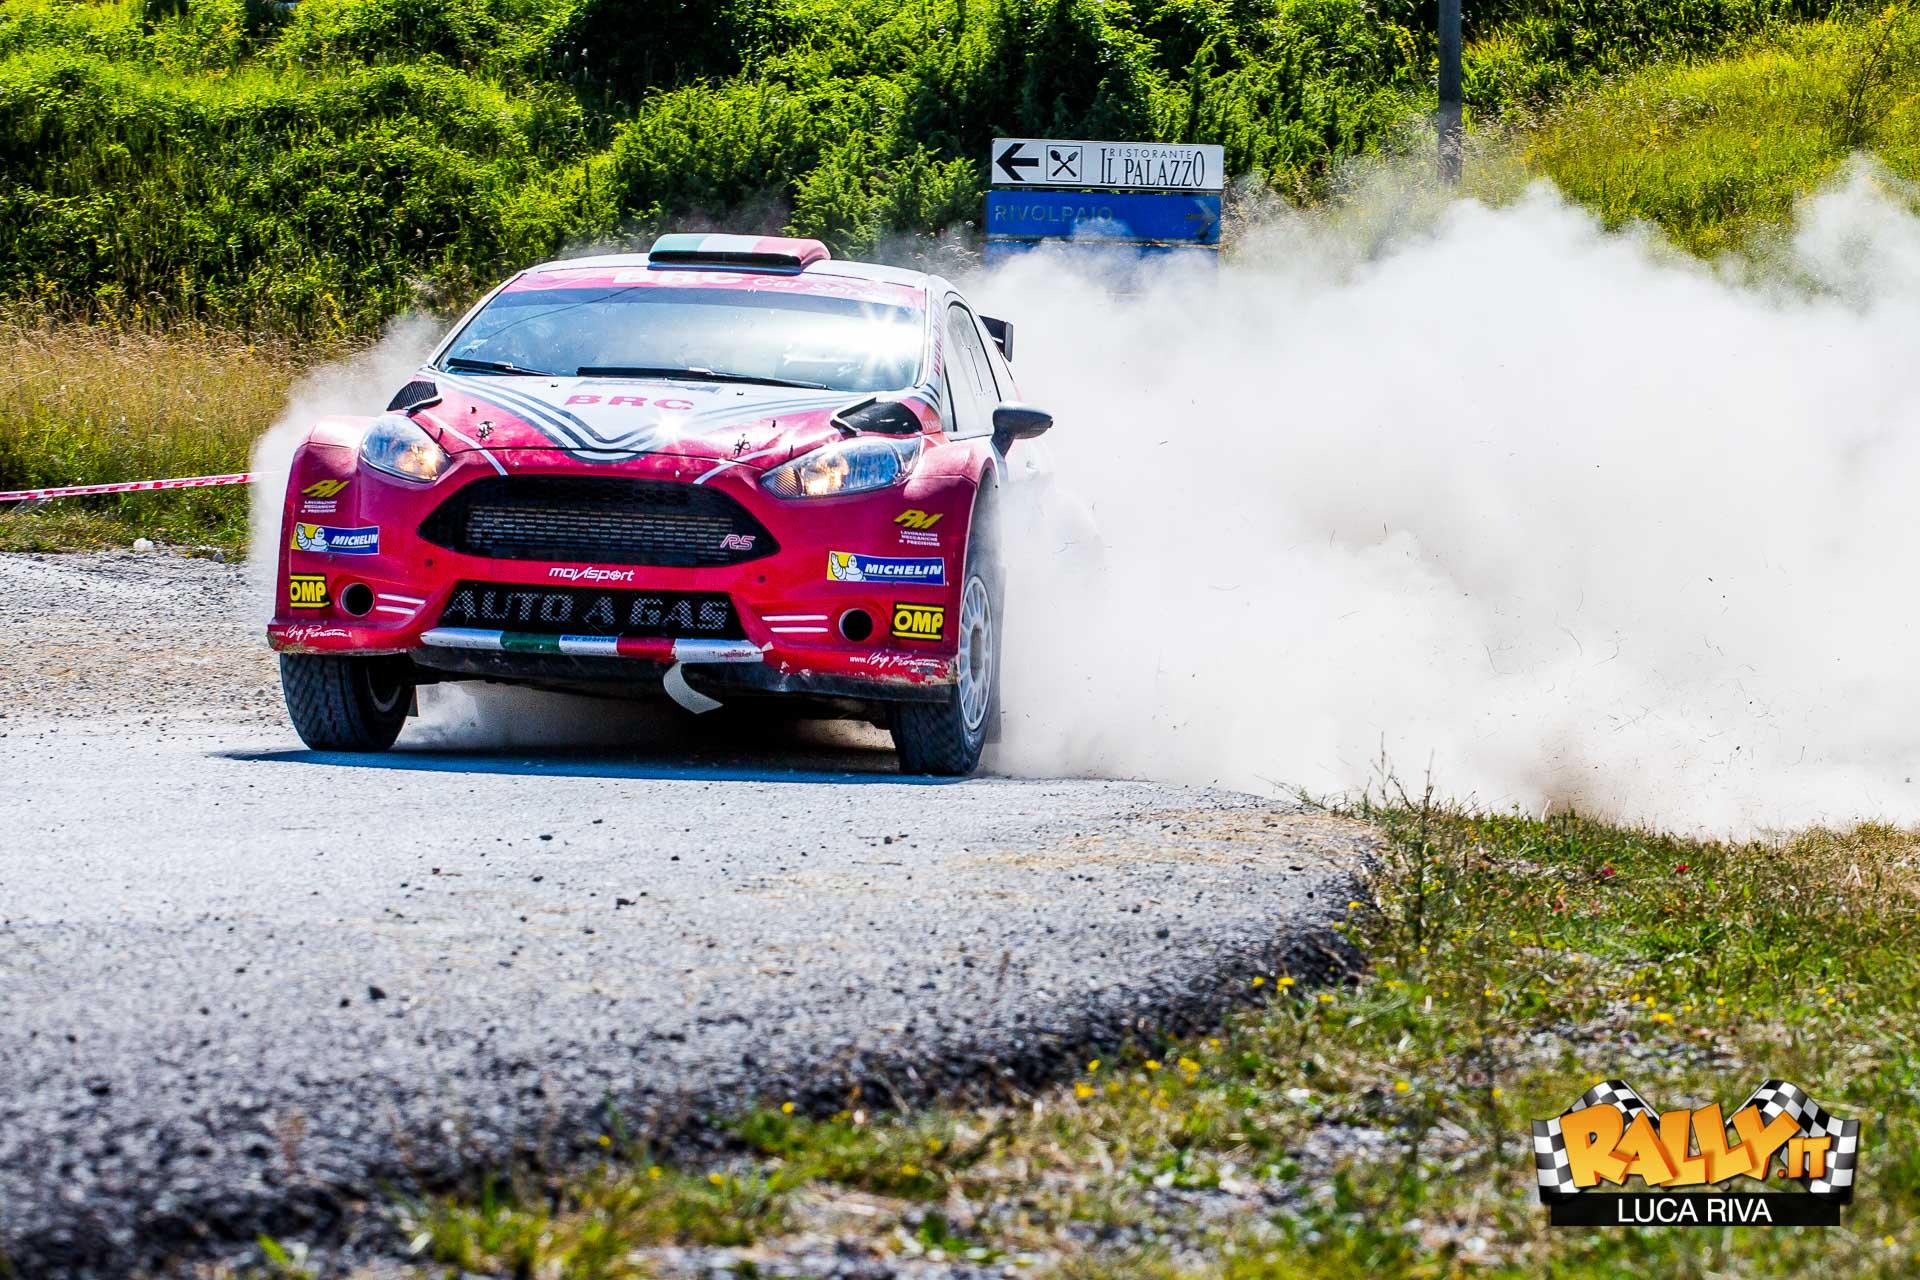 LucaRivaStudio-RallySanMarino2015-b-28.jpg